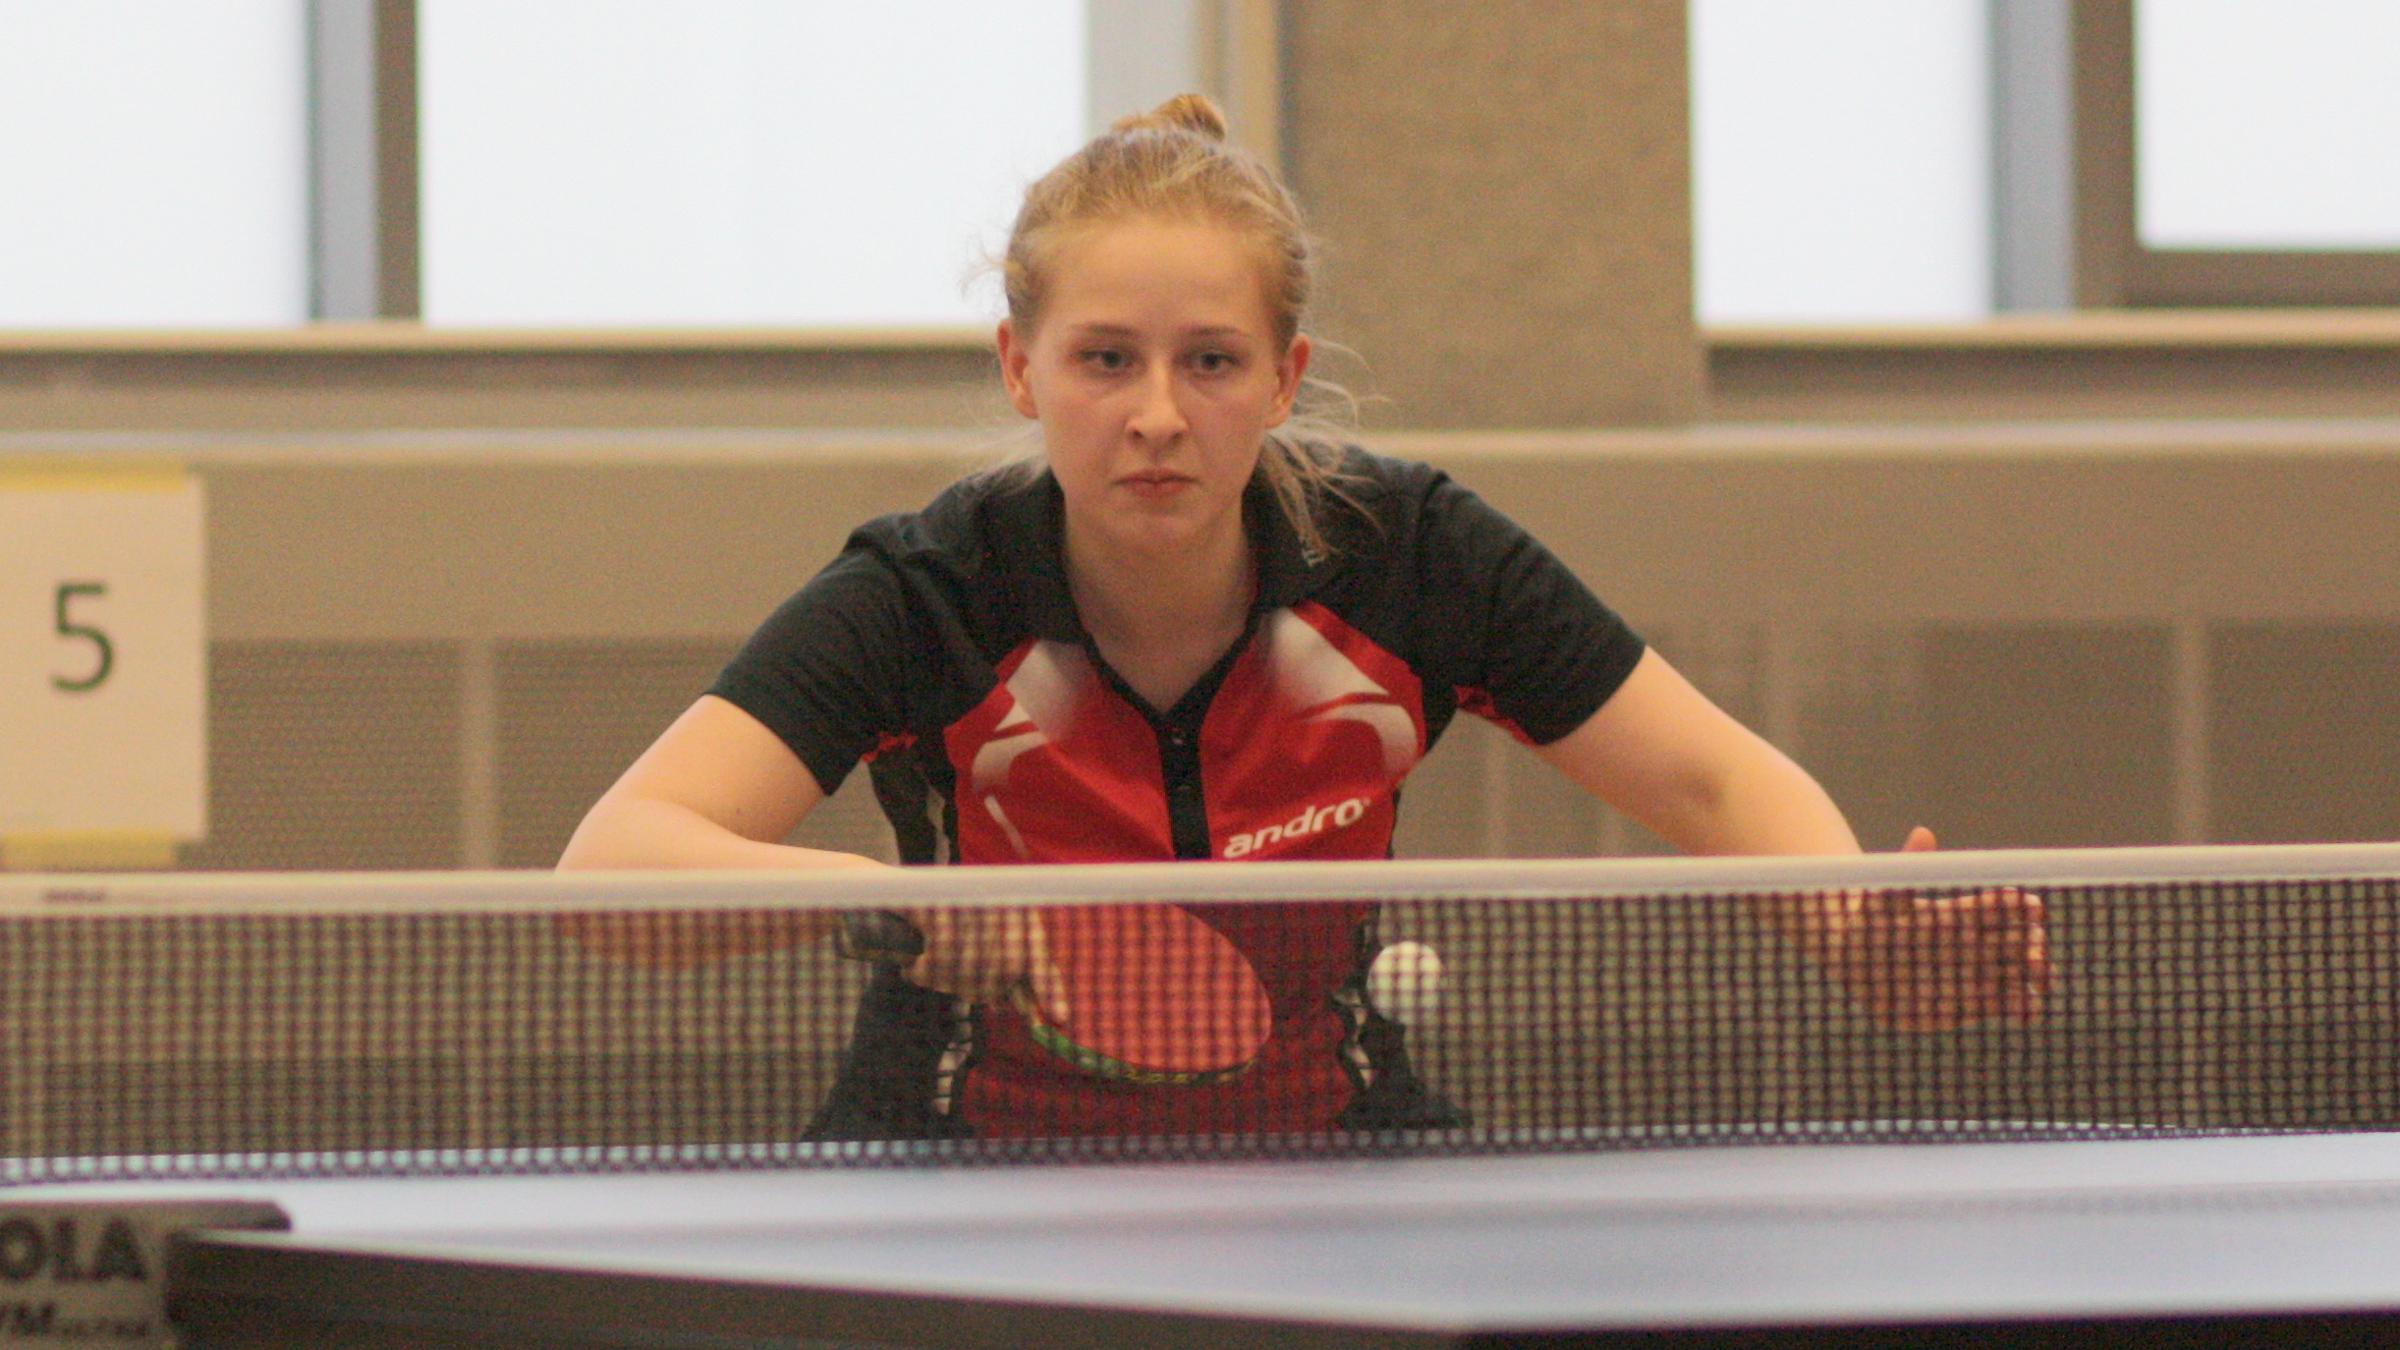 Sophie bei den Vereinsmeisterschaften 2017